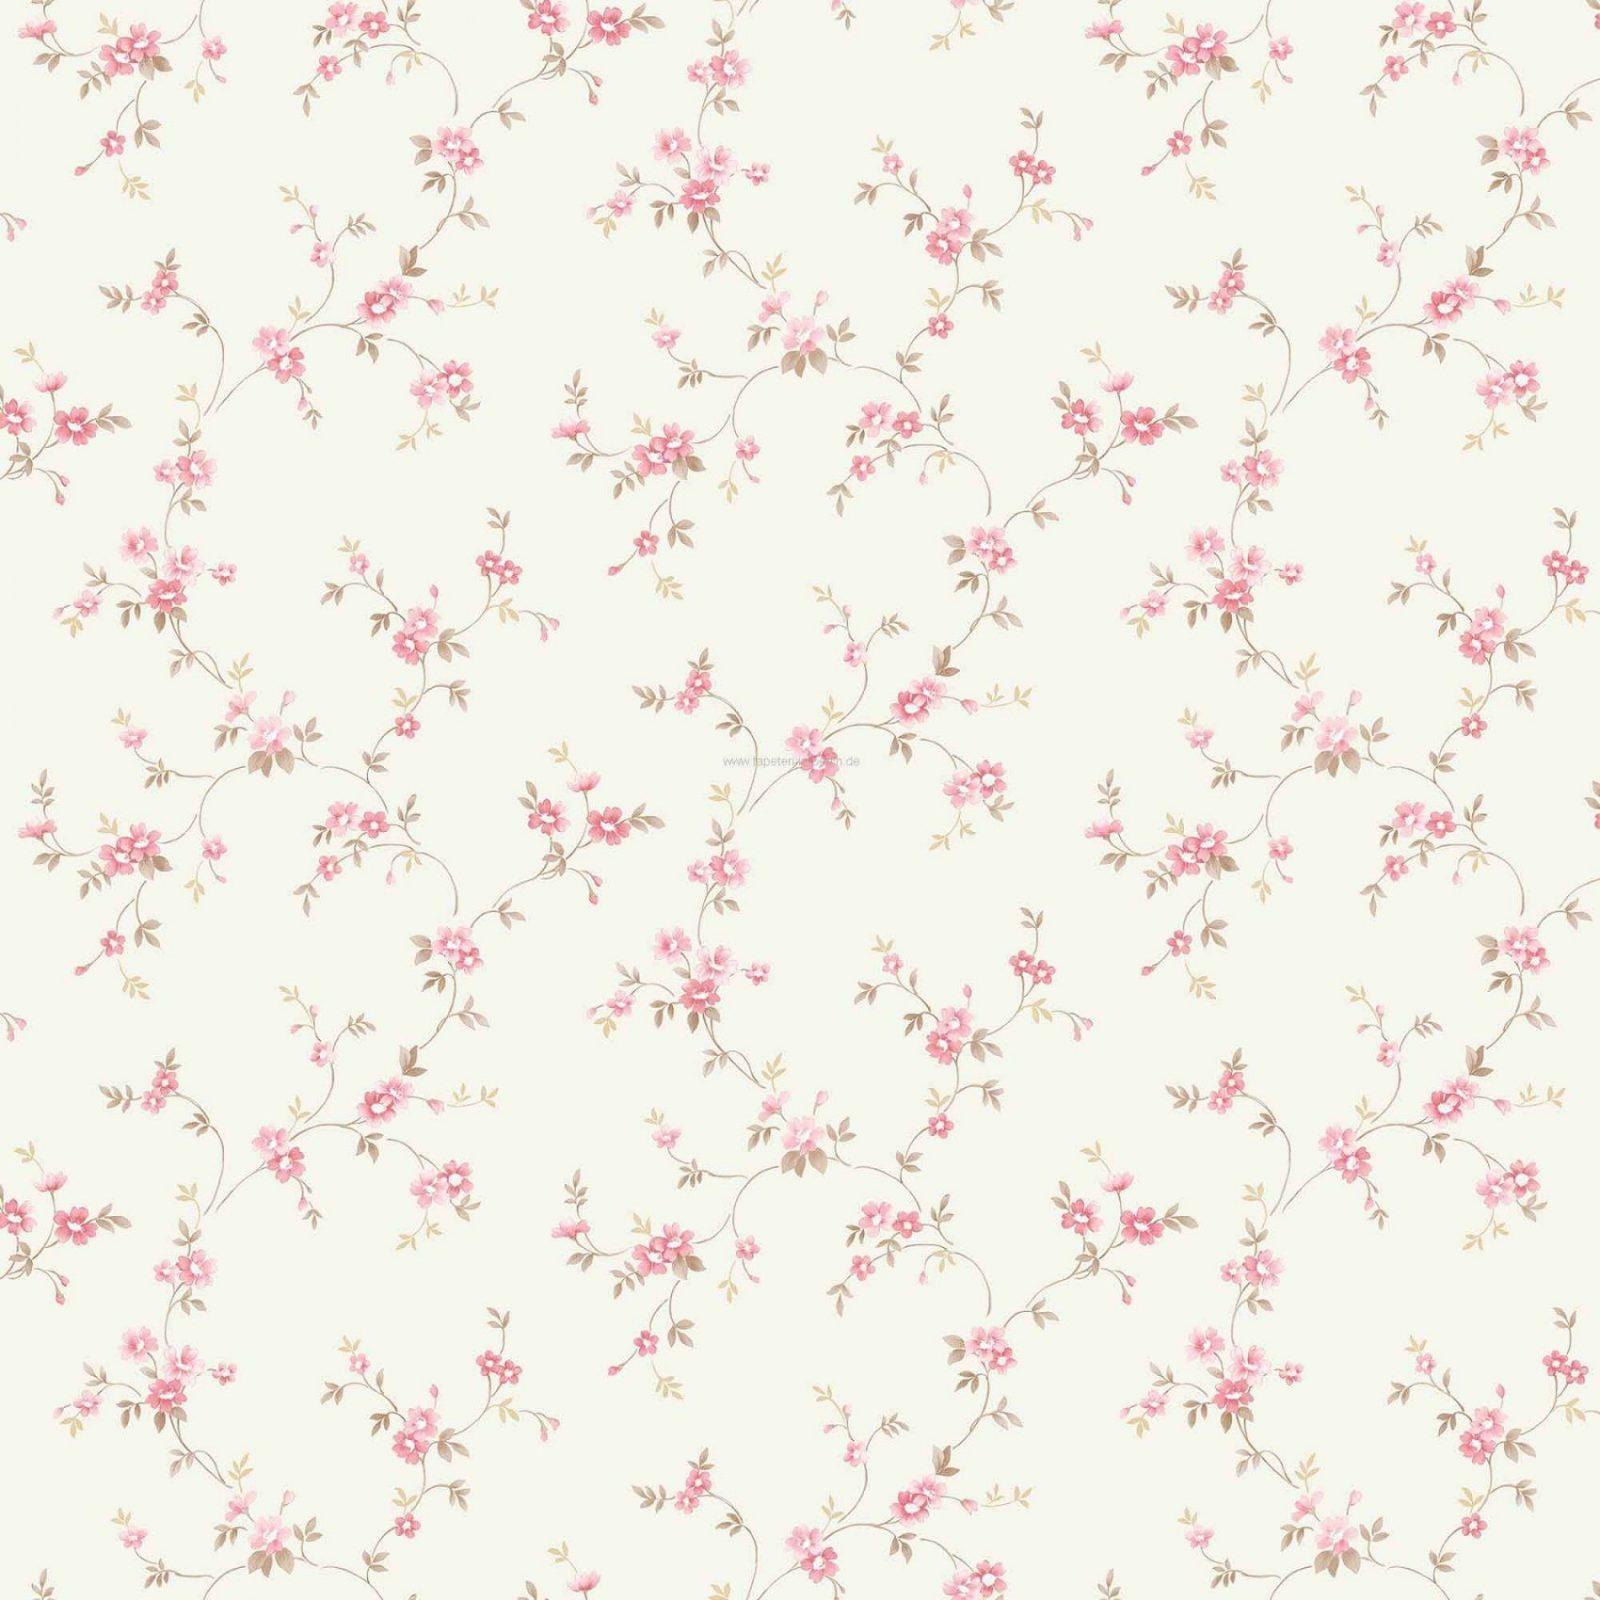 tapete landhaus floral bl mchen haus design ideen. Black Bedroom Furniture Sets. Home Design Ideas